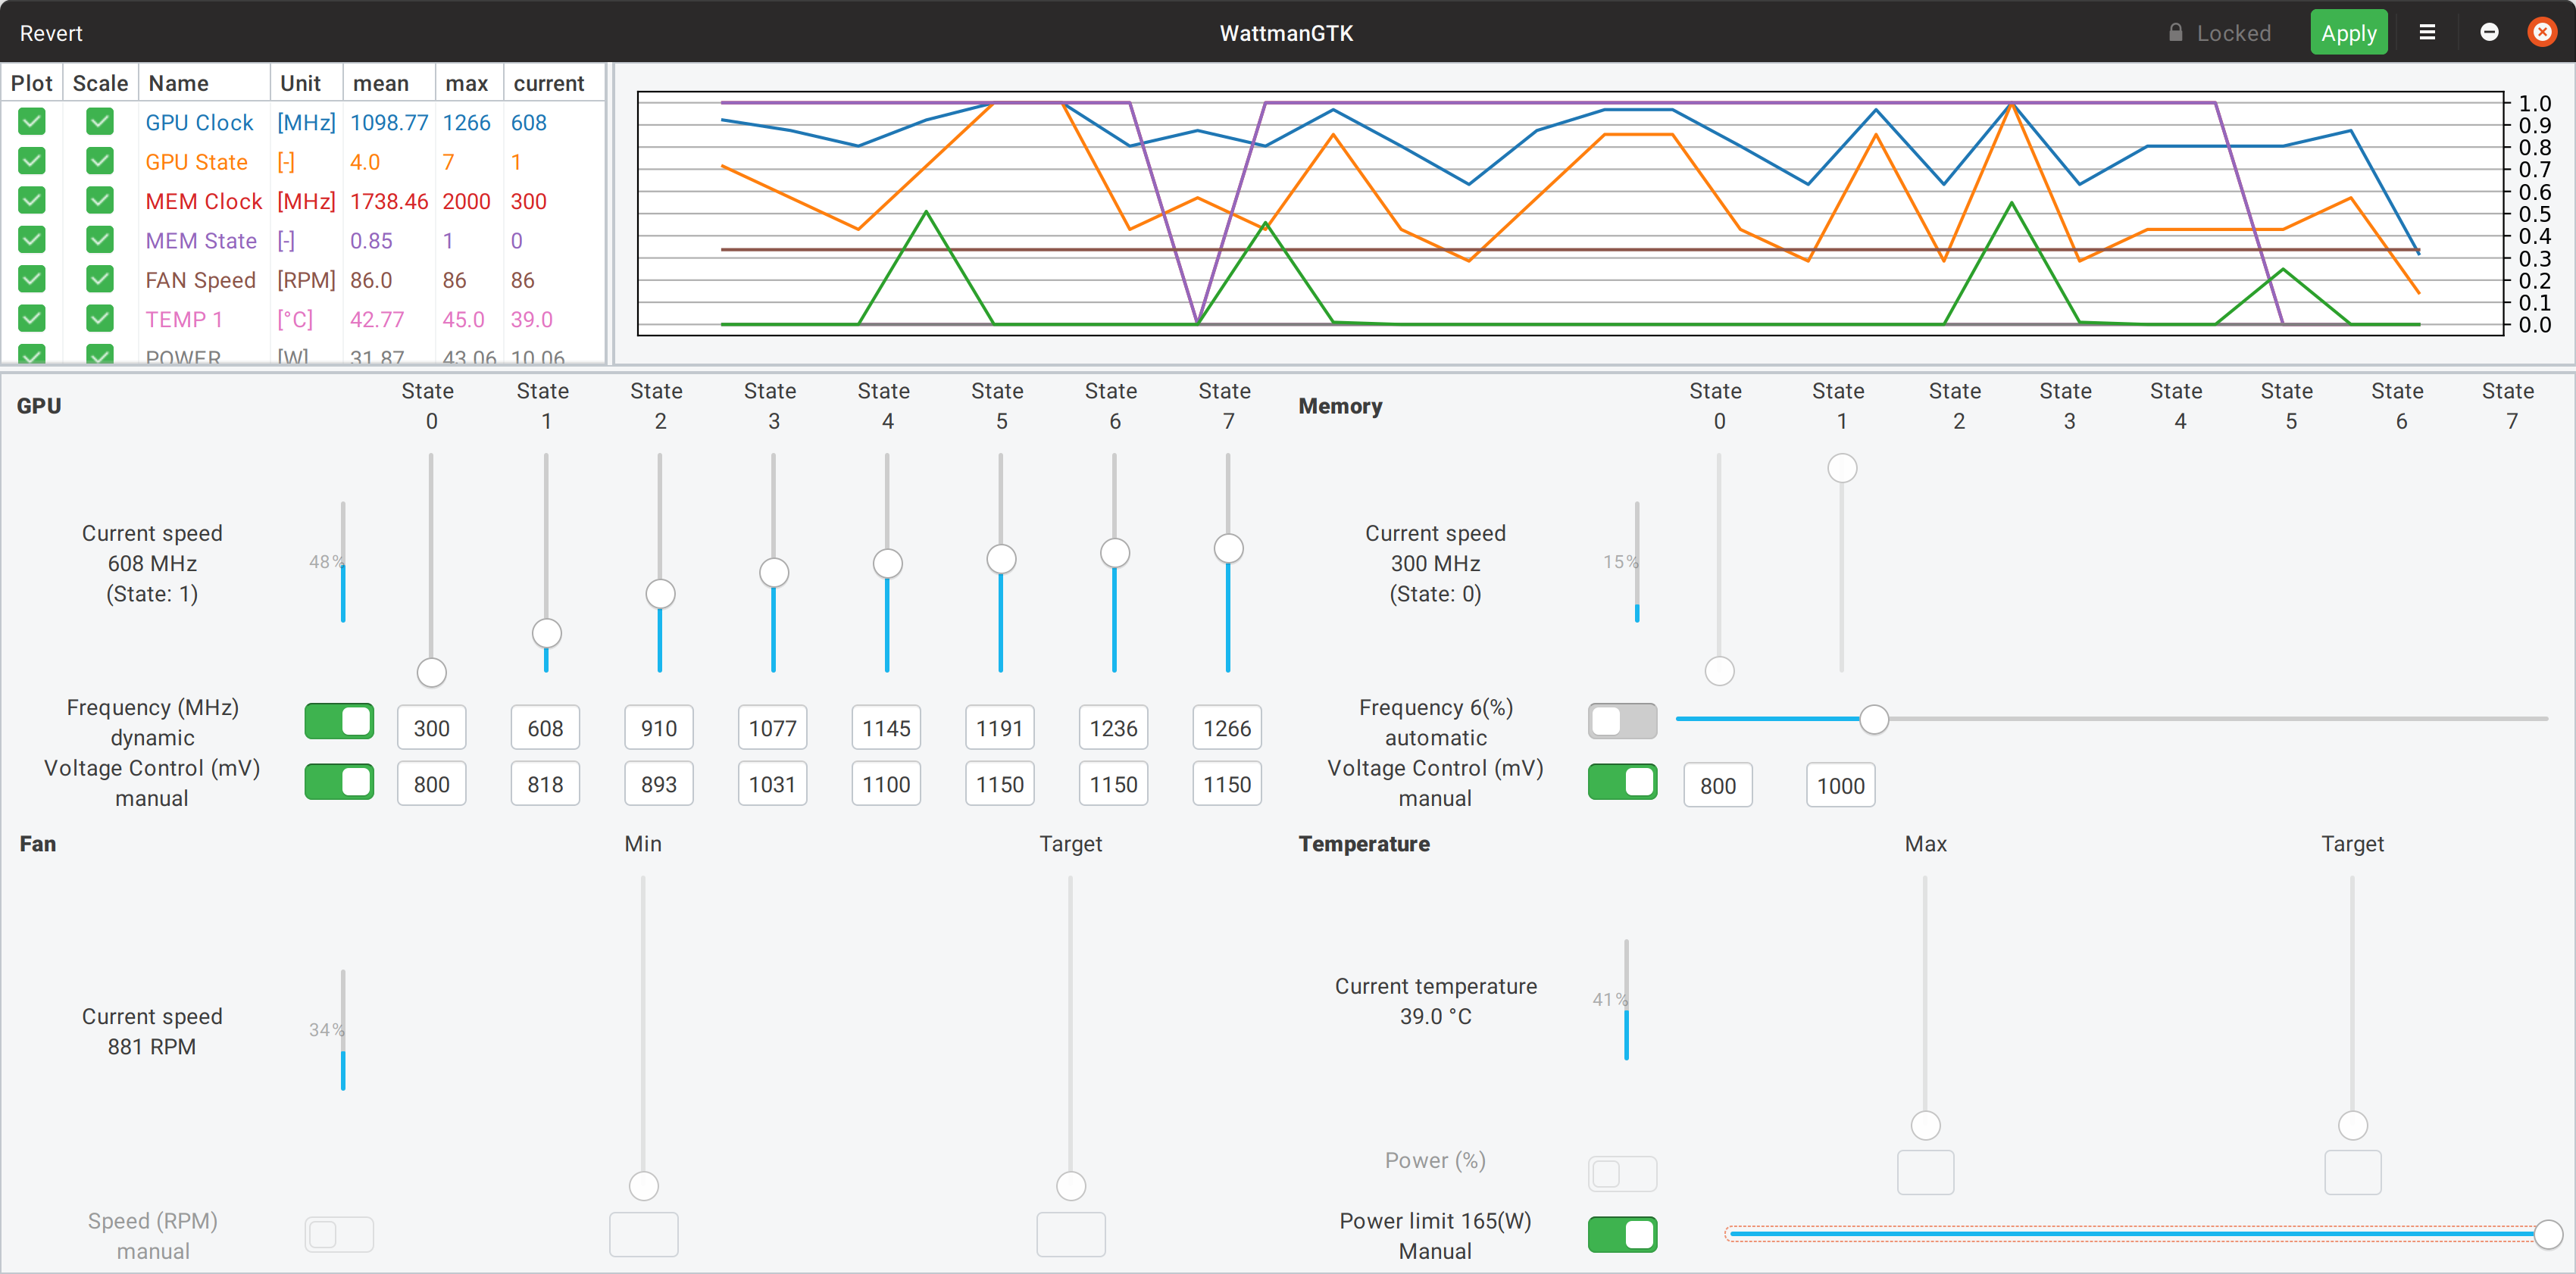 GitHub - BoukeHaarsma23/WattmanGTK: A Wattman-like GTK3+ GUI